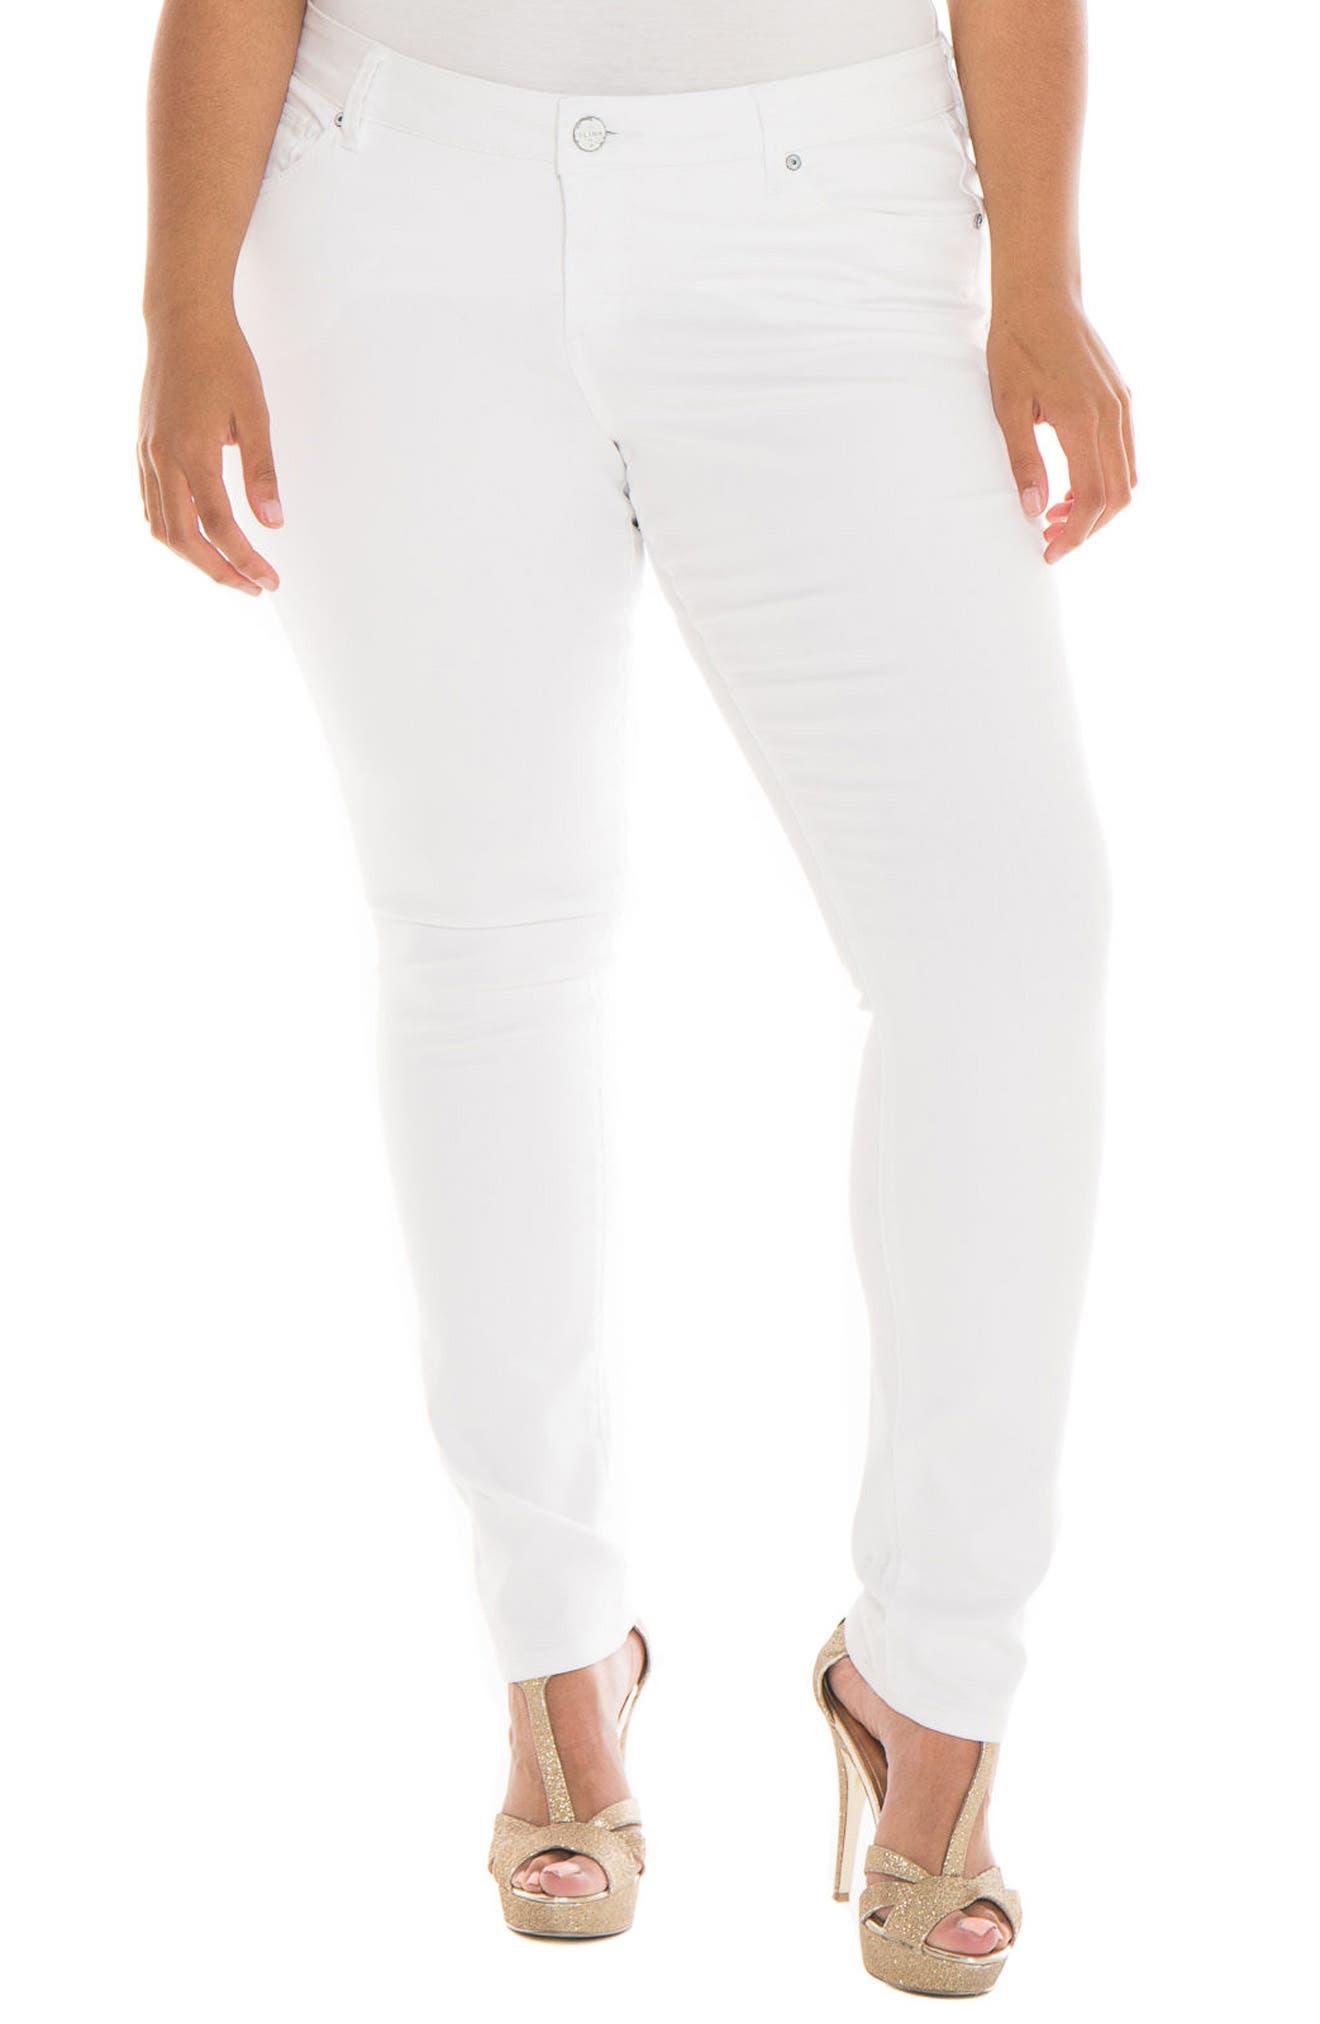 SLINK Jeans Skinny Jeans (Charlie) (Plus Size)